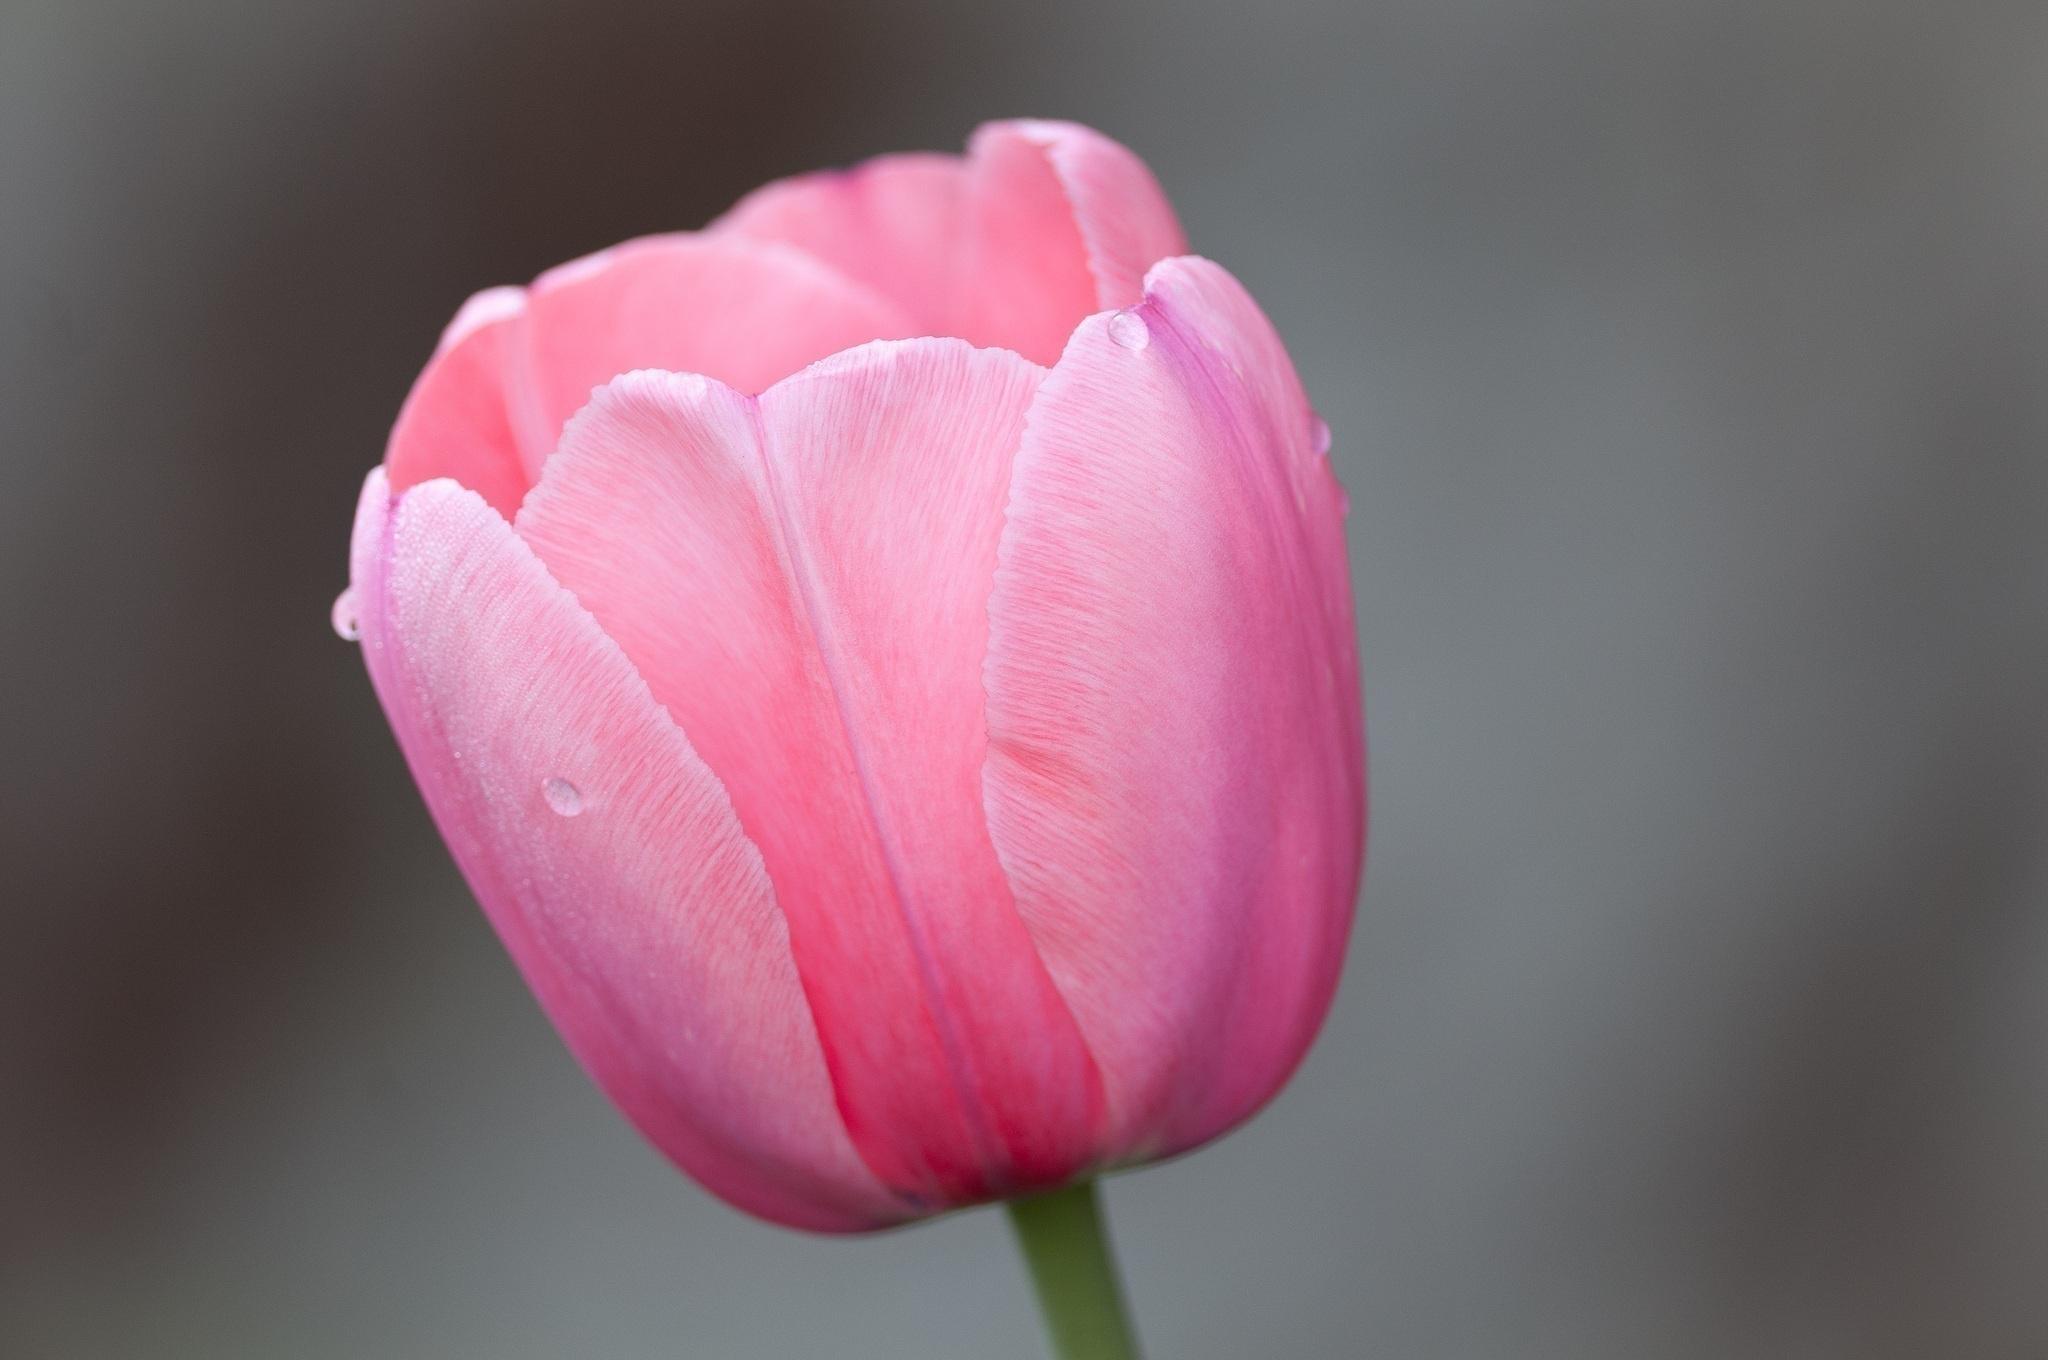 Cute Baby Girl Good Night Wallpaper Hd Flower Tulip Pink Macro Bokeh Photo Download Wallpaper